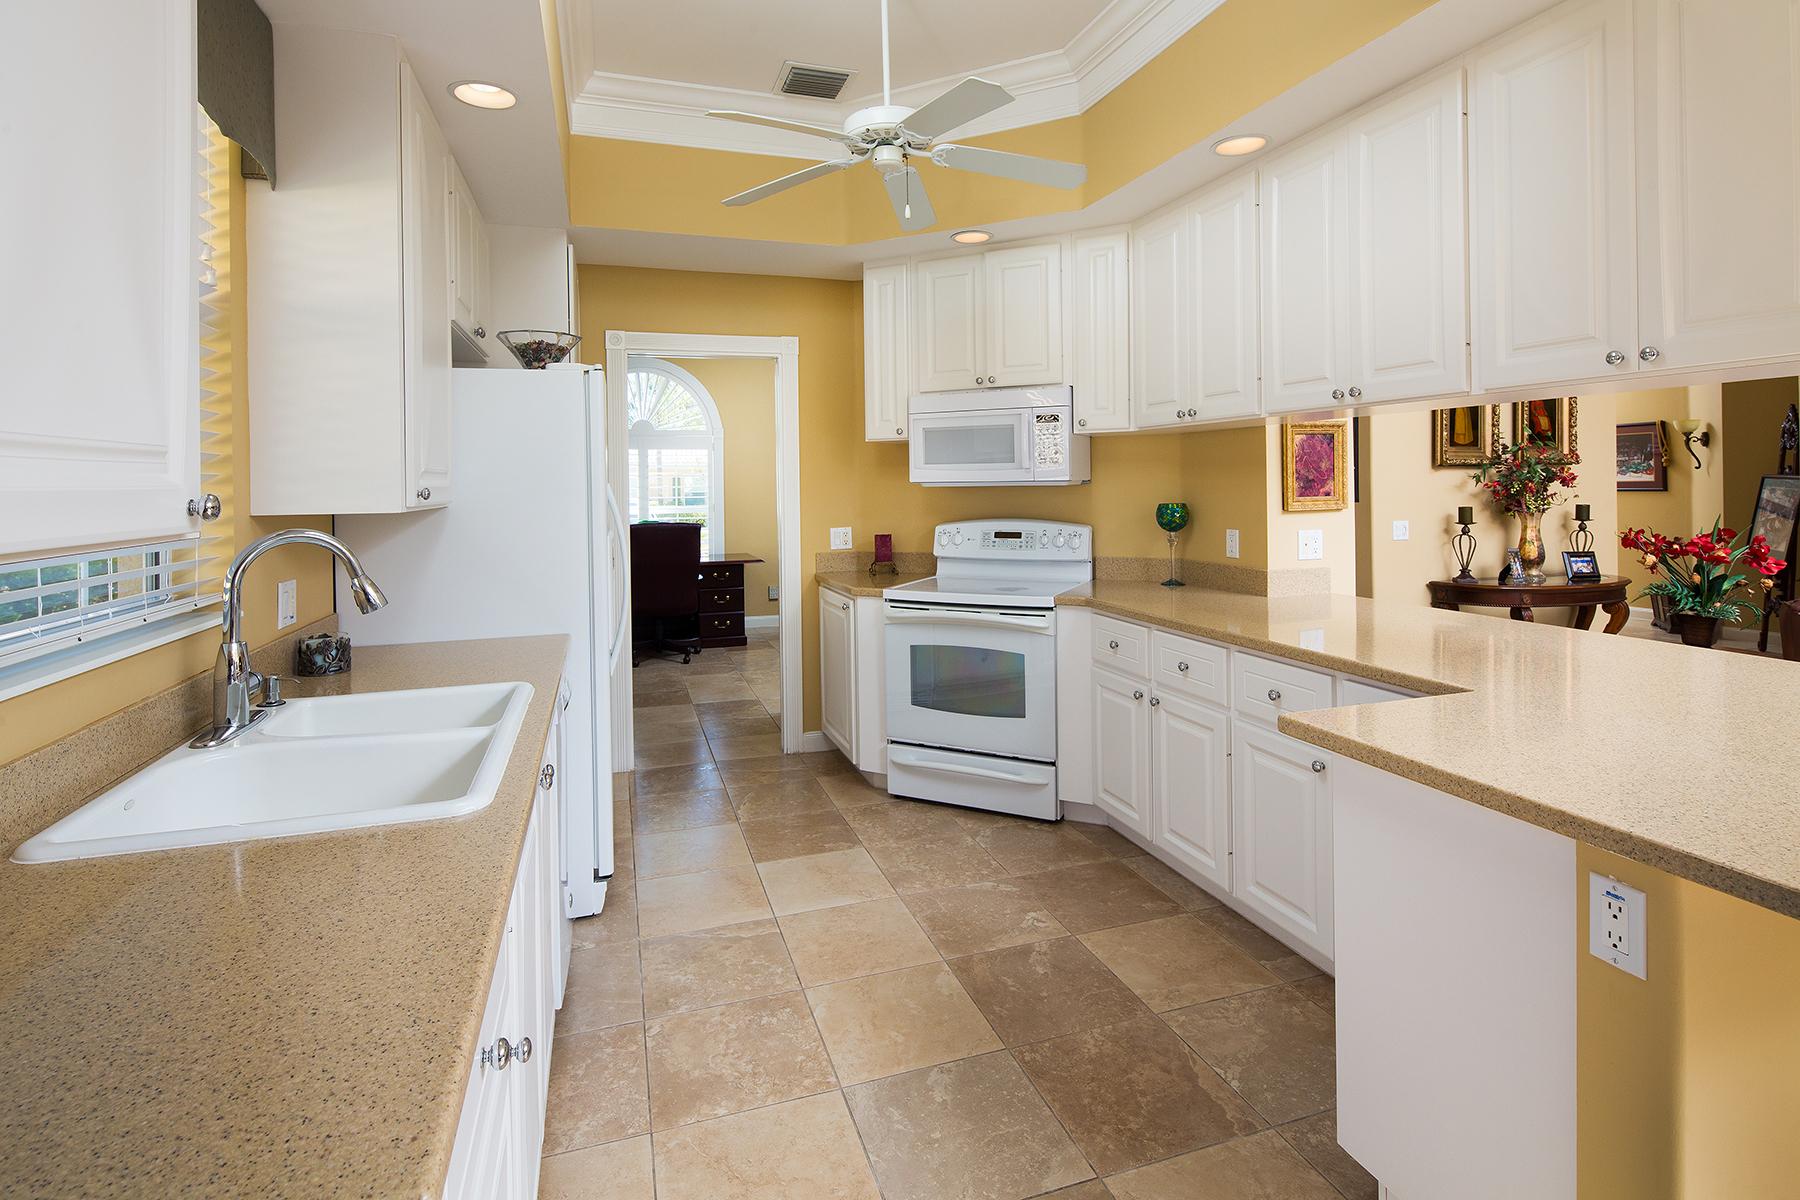 Additional photo for property listing at VILLAGE WALK OF BONITA SPRINGS 28628  Wahoo Dr,  Bonita Springs, Florida 34135 United States